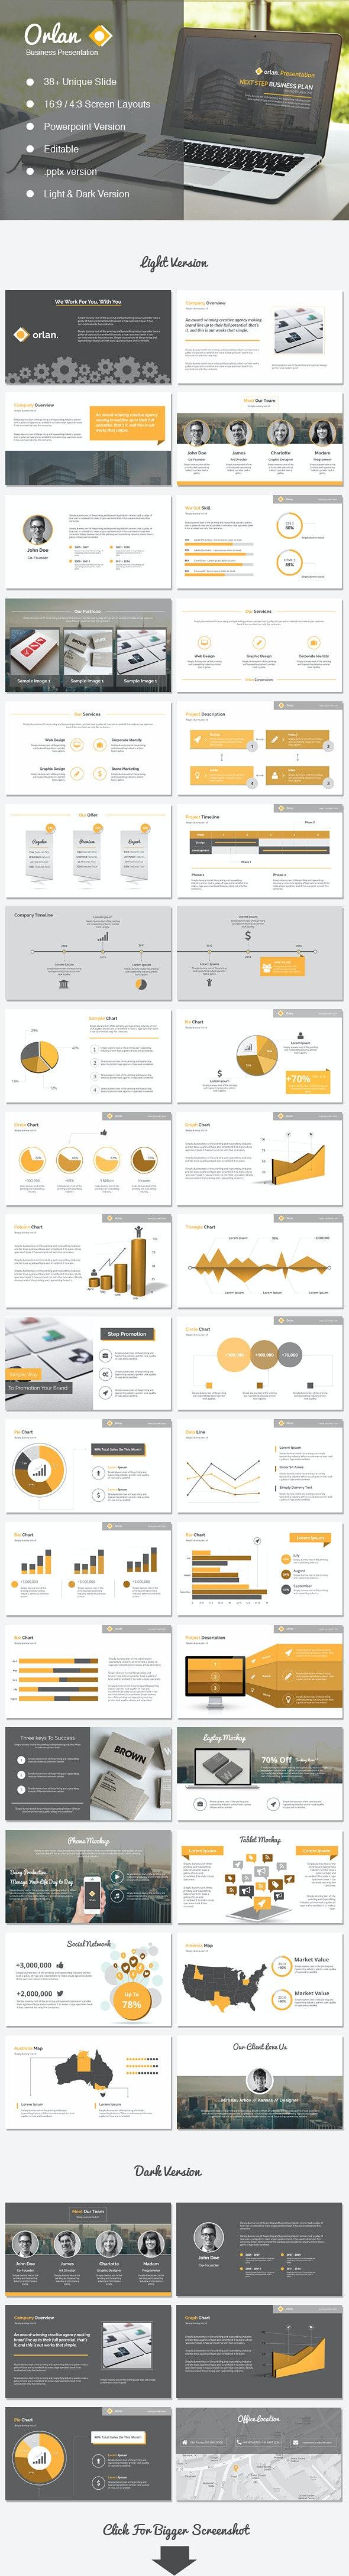 Orlan Powerpoint Business Presentation - Business PowerPoint Templates